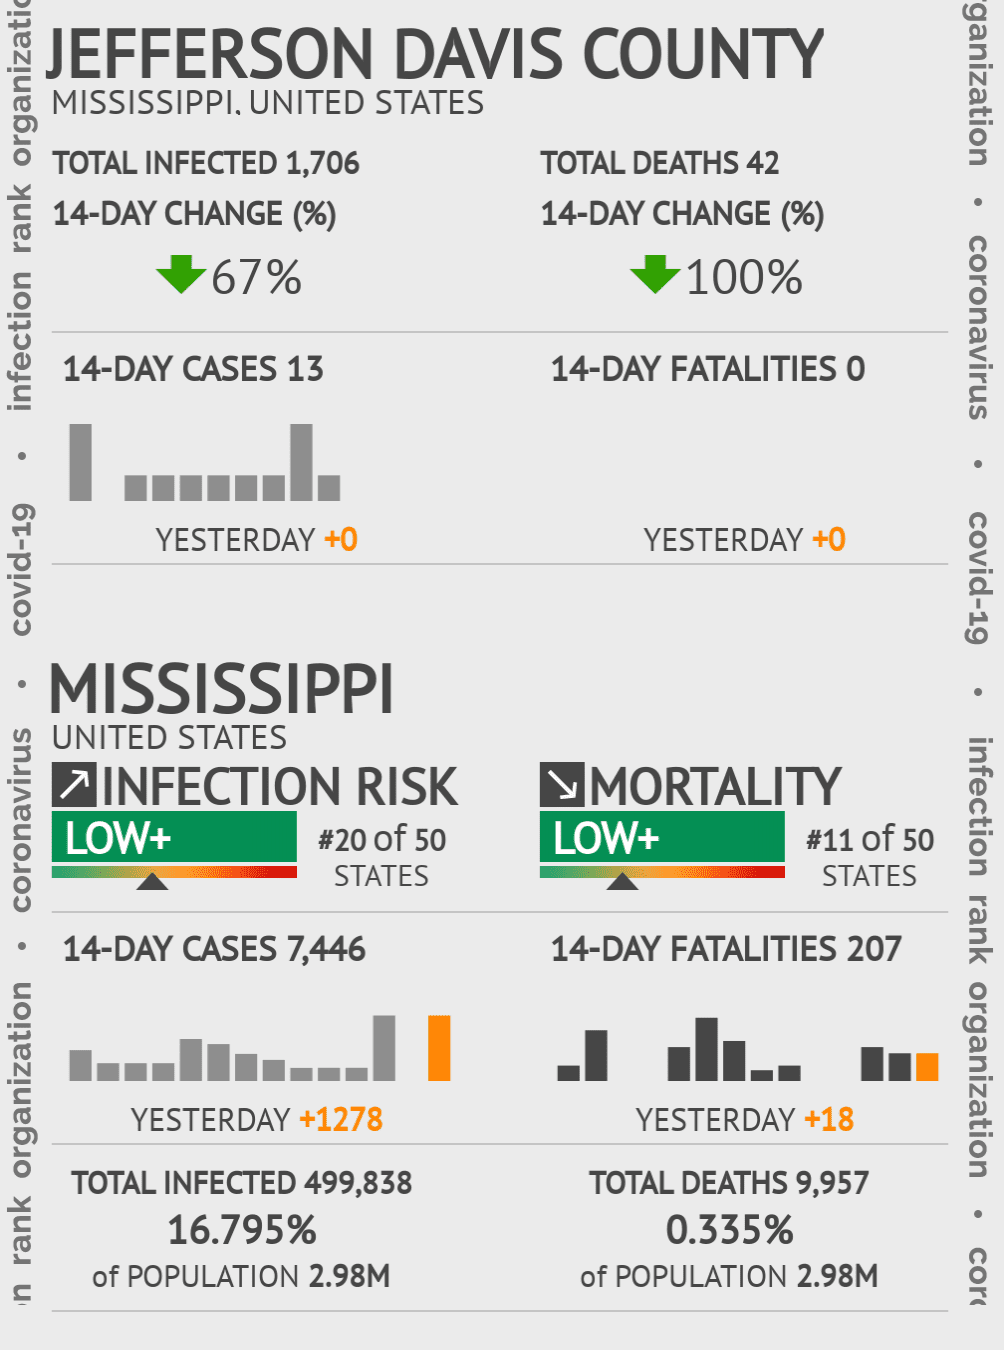 Jefferson Davis County Coronavirus Covid-19 Risk of Infection on July 24, 2021